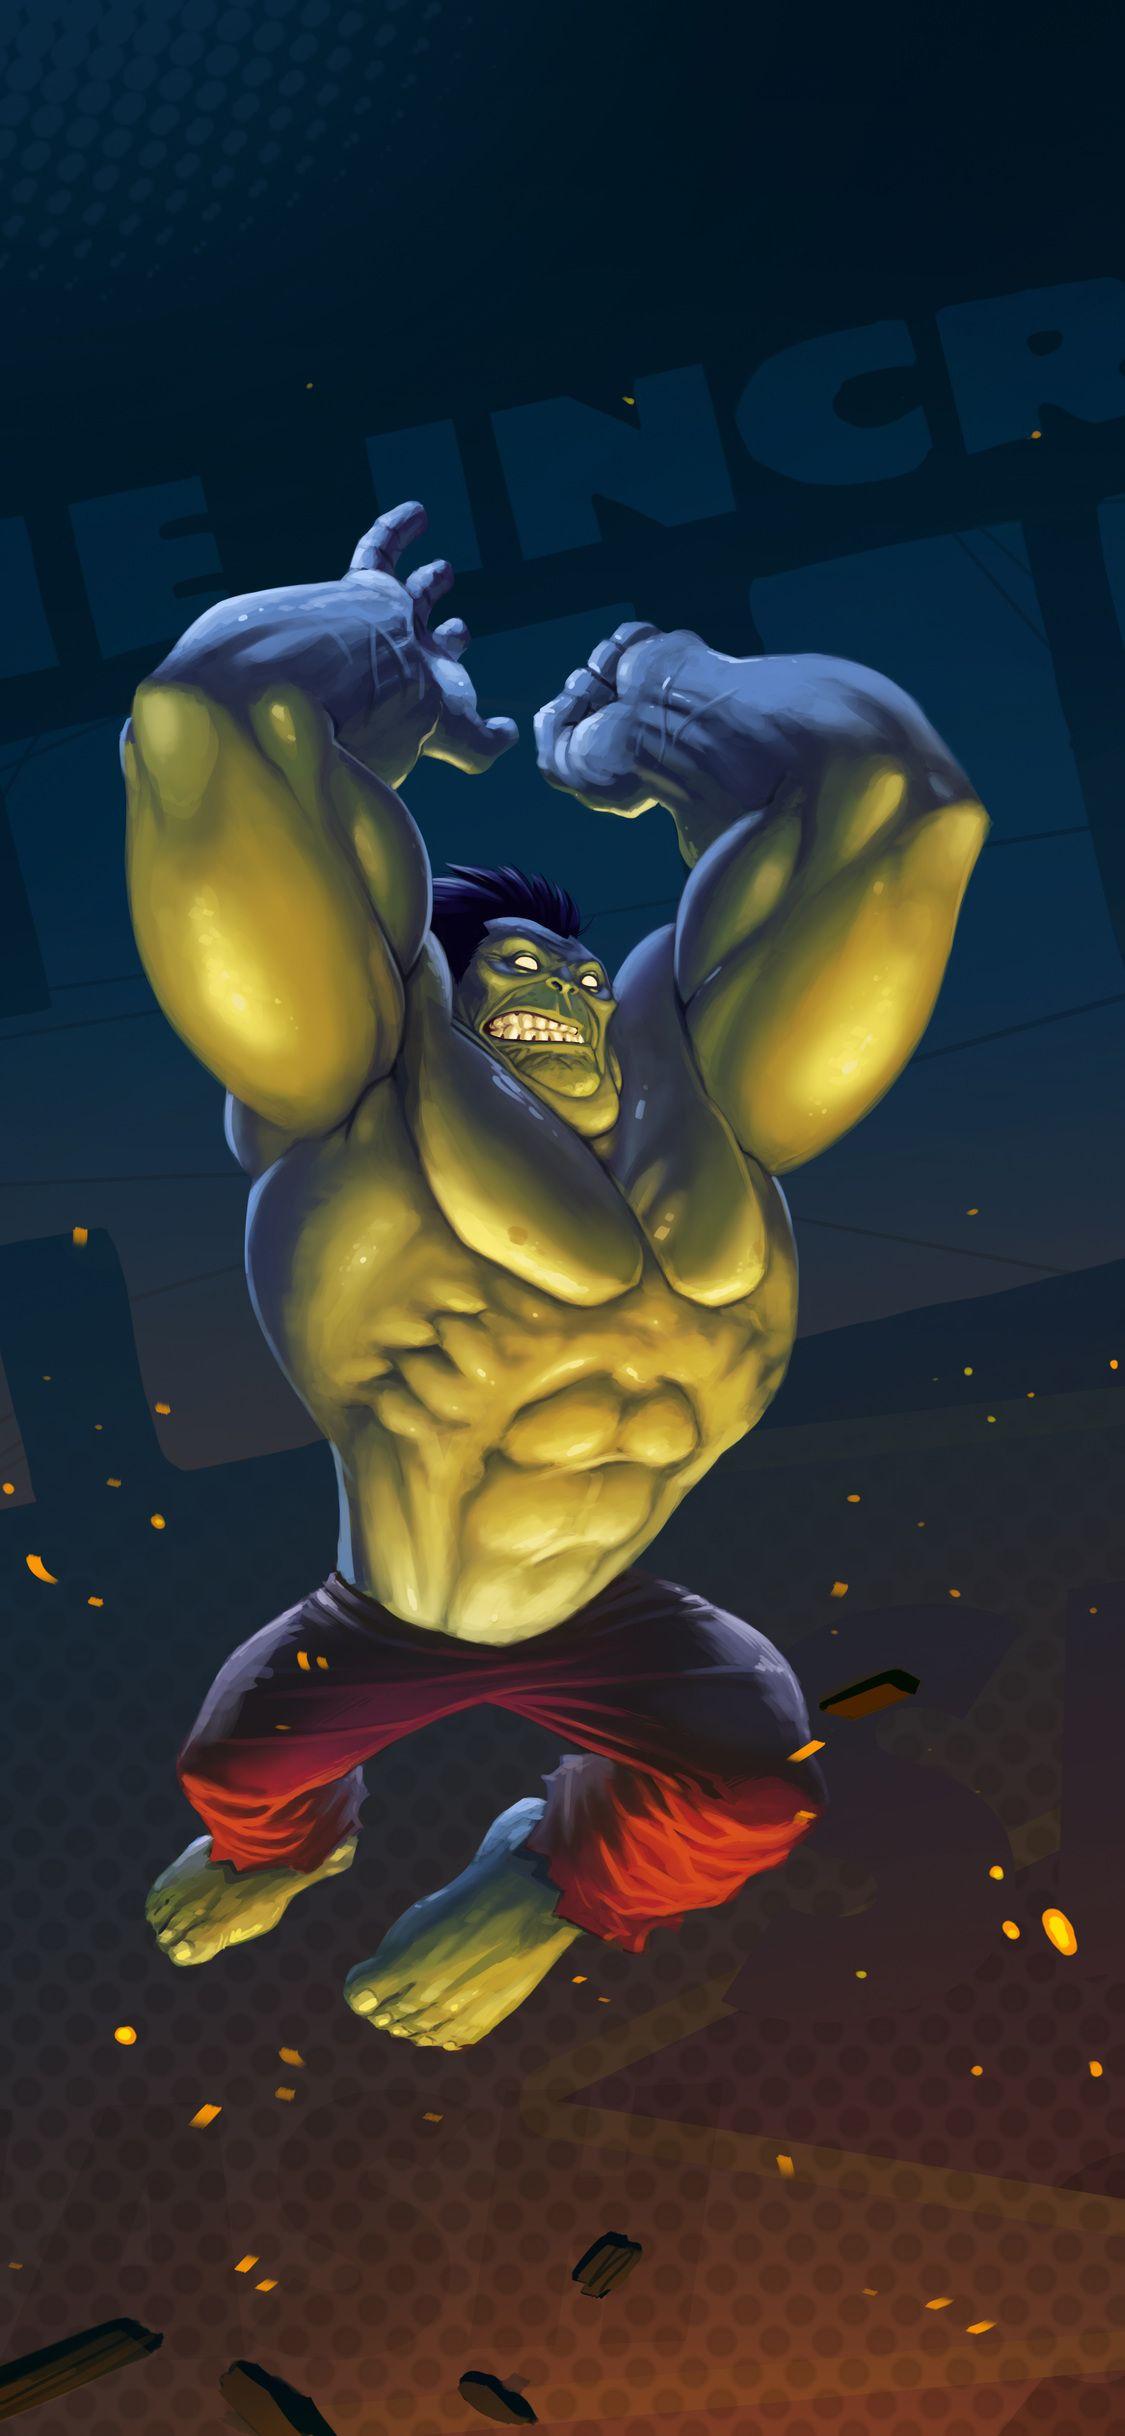 Hulk Artwork Iphone X Marvel Comics Hulk Hulk Artwork Hulk Marvel